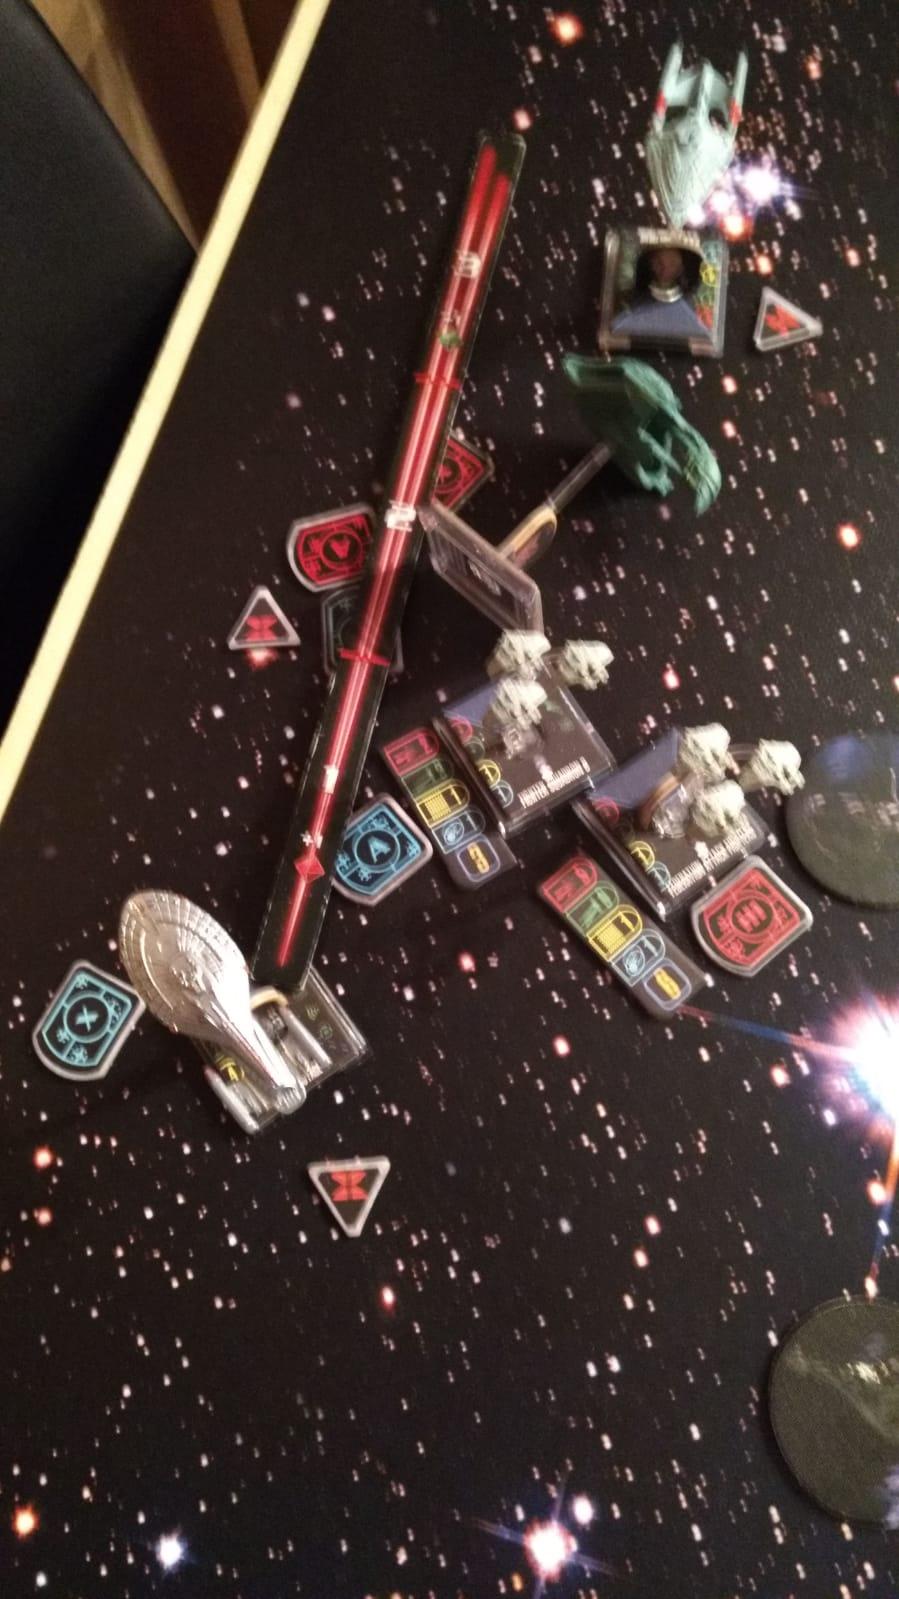 Kampf um Jouret [Föd. vs. Romulaner] Spiel111